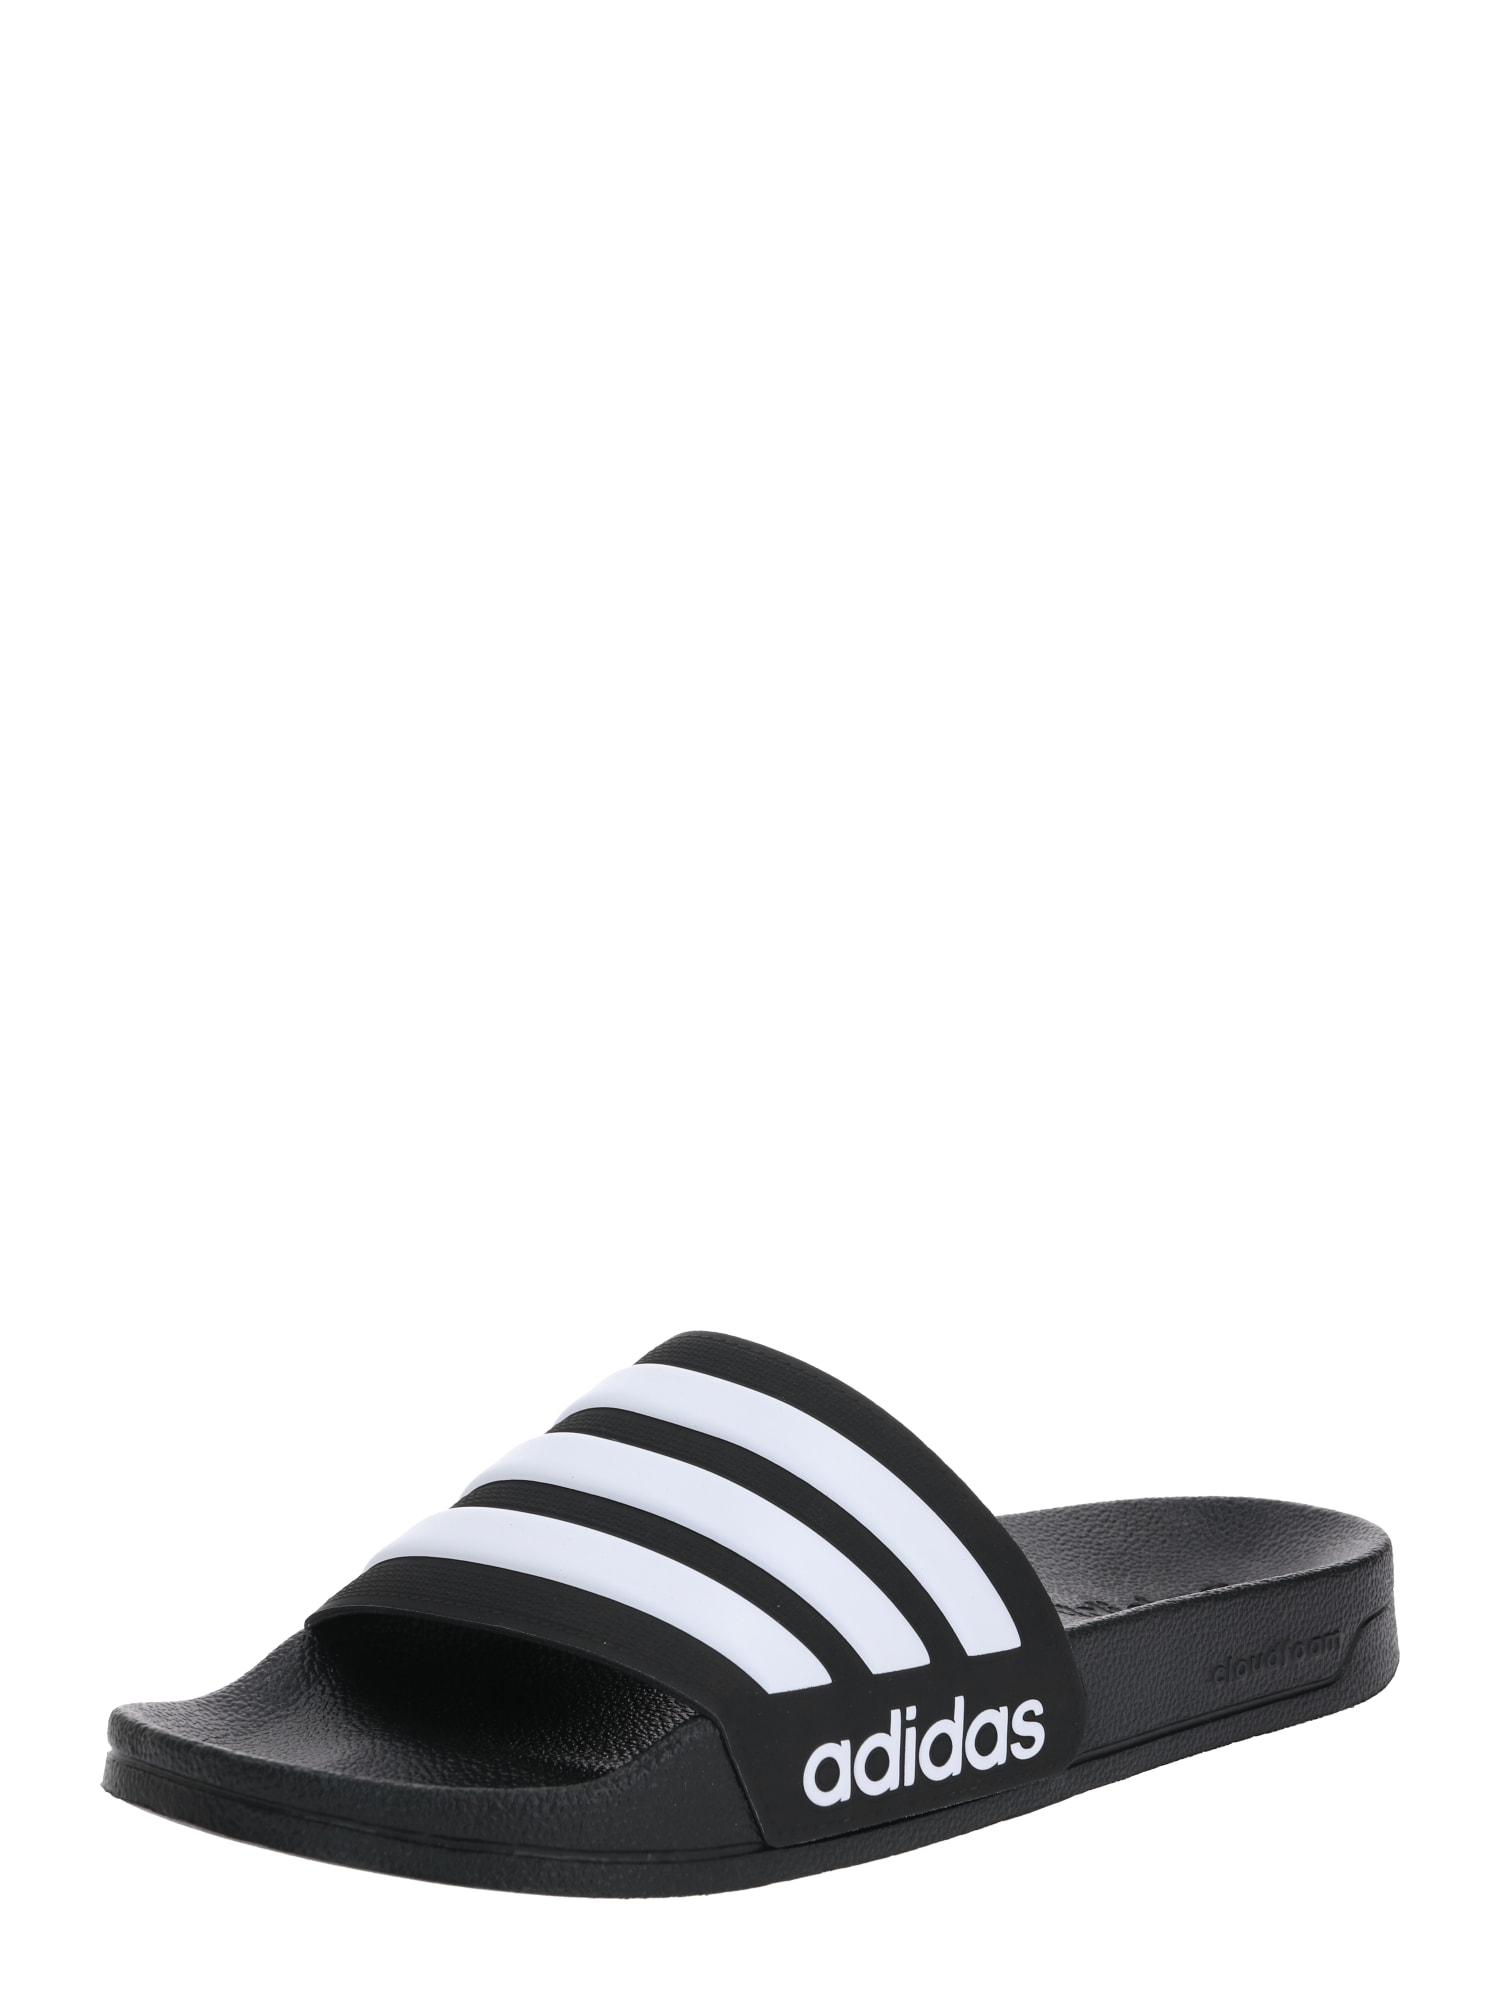 ADIDAS PERFORMANCE Flip-flops 'Adilette'  alb / negru